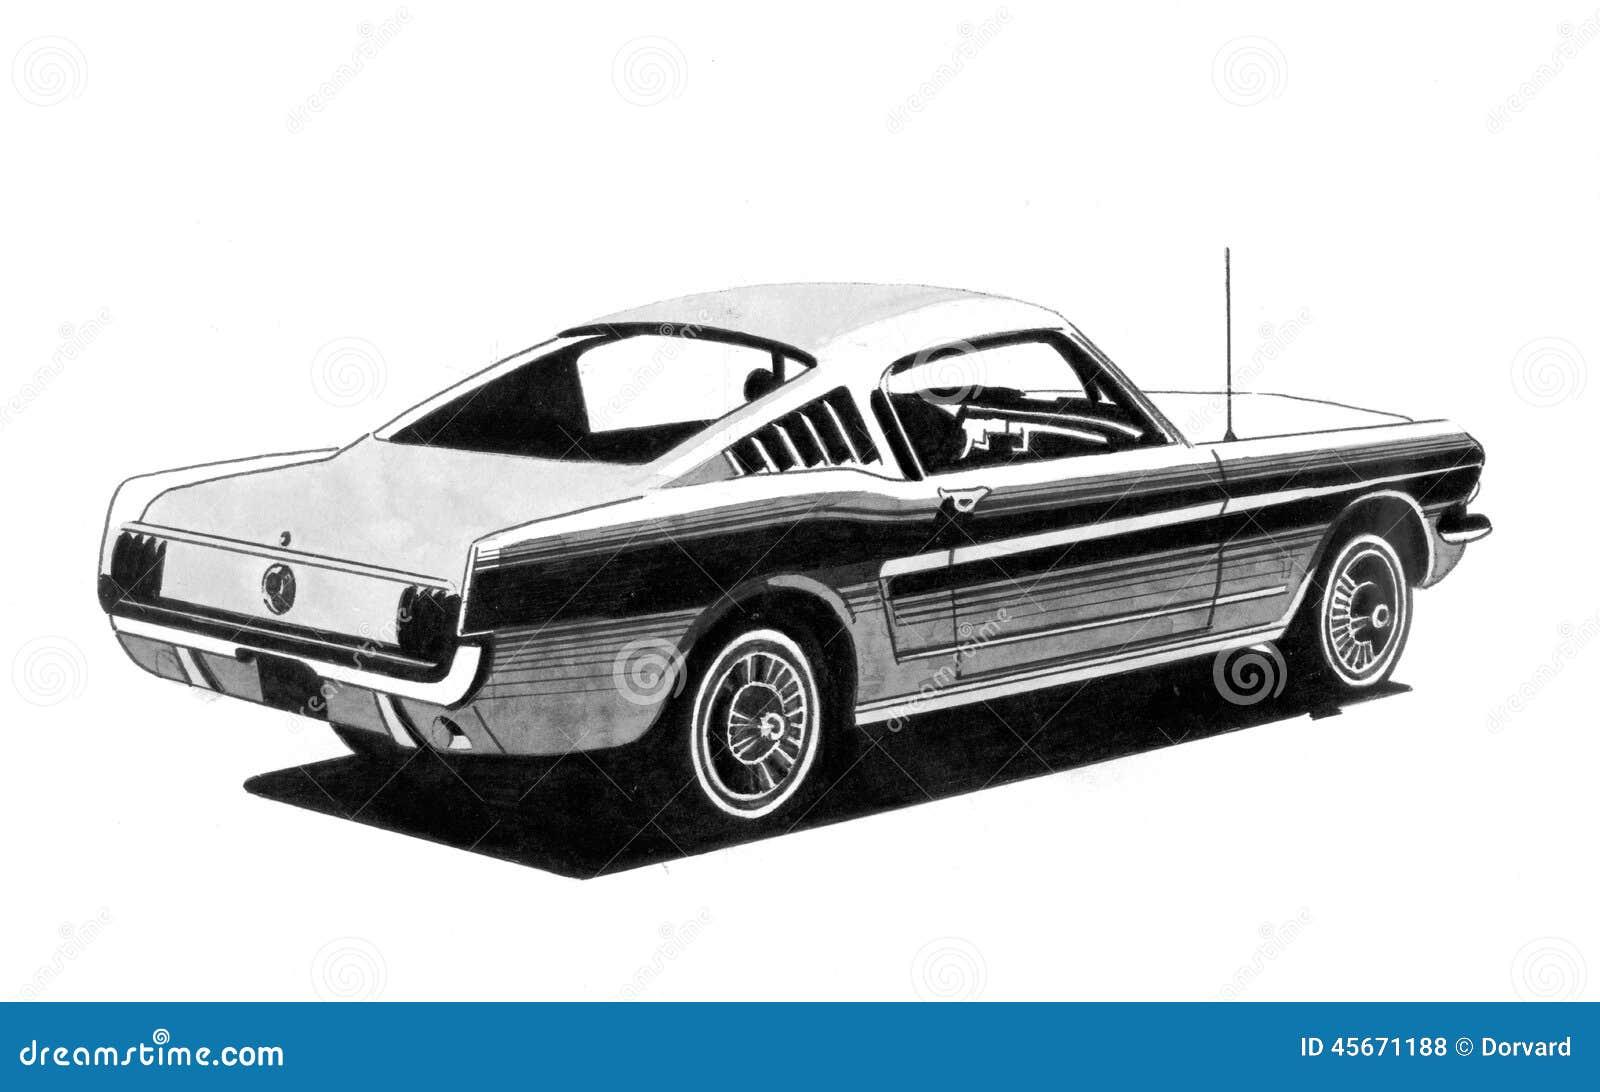 Retro Sport Car Drawing Stock Illustration Illustration Of Image